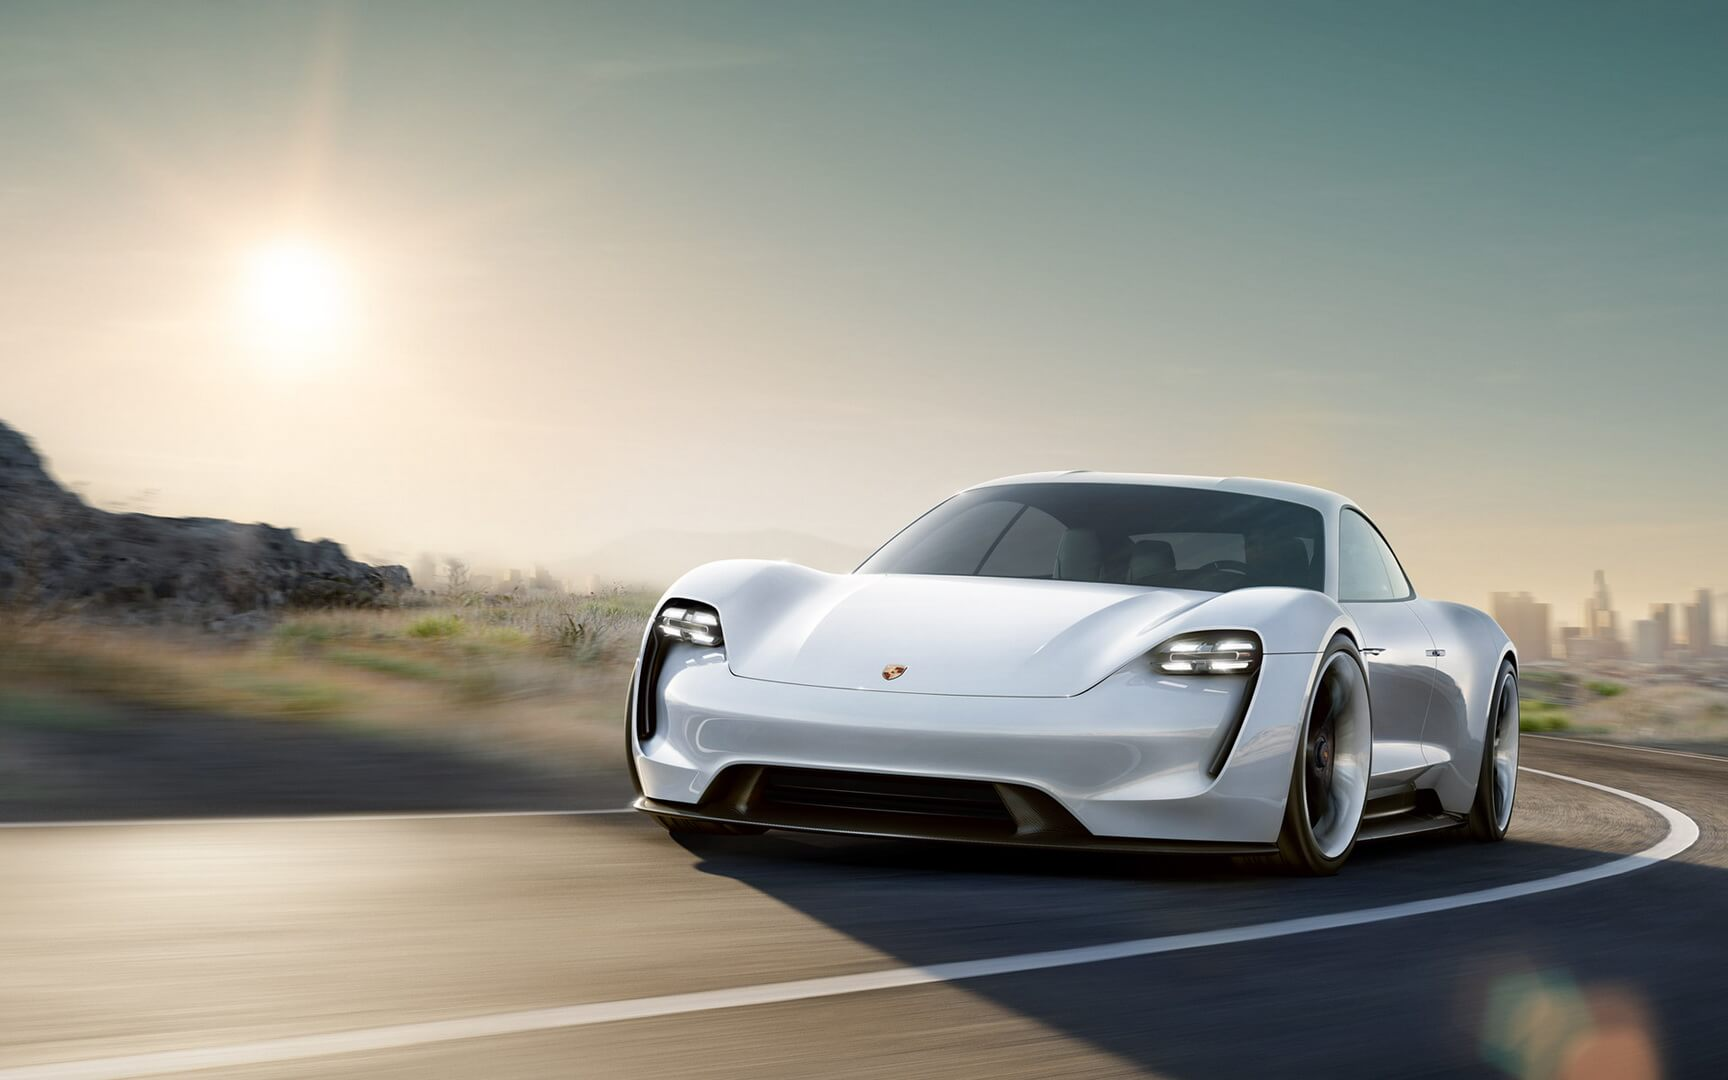 Porsche Taycan (Mission E)